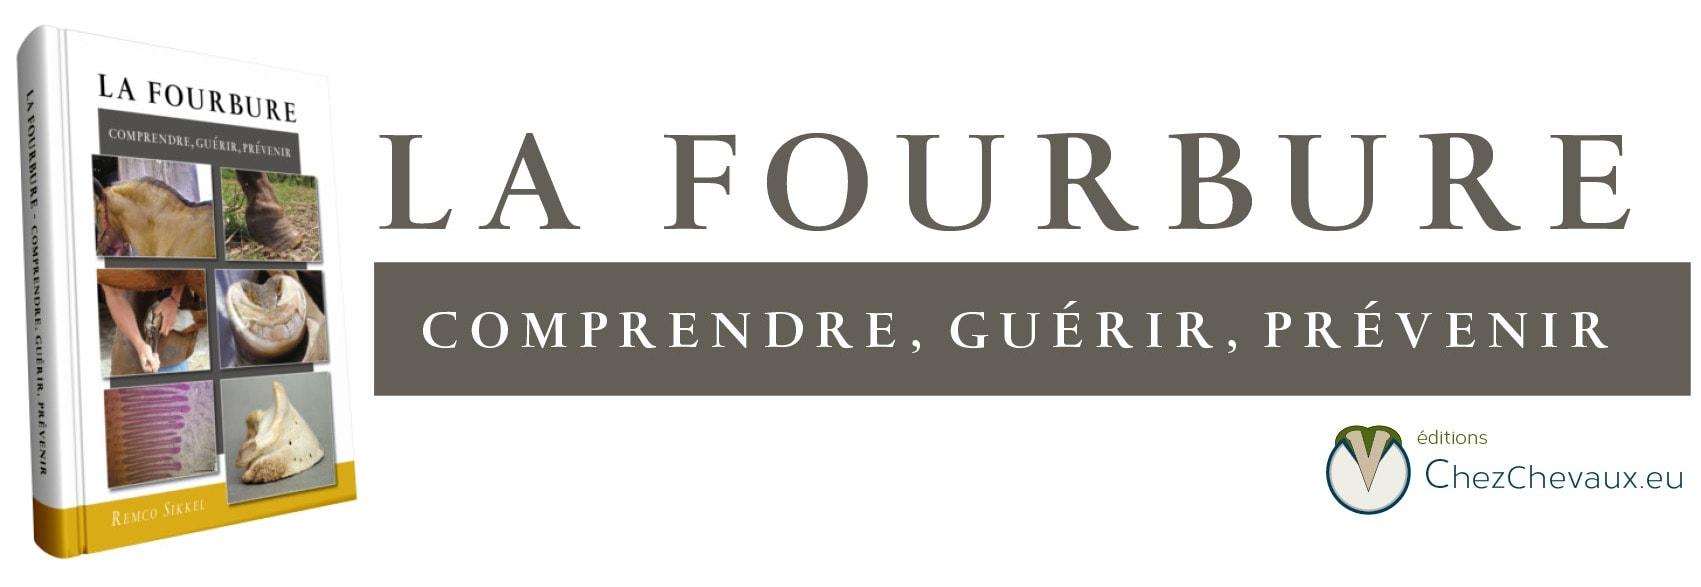 La Fourbure : comprendre, guérir, prévenir